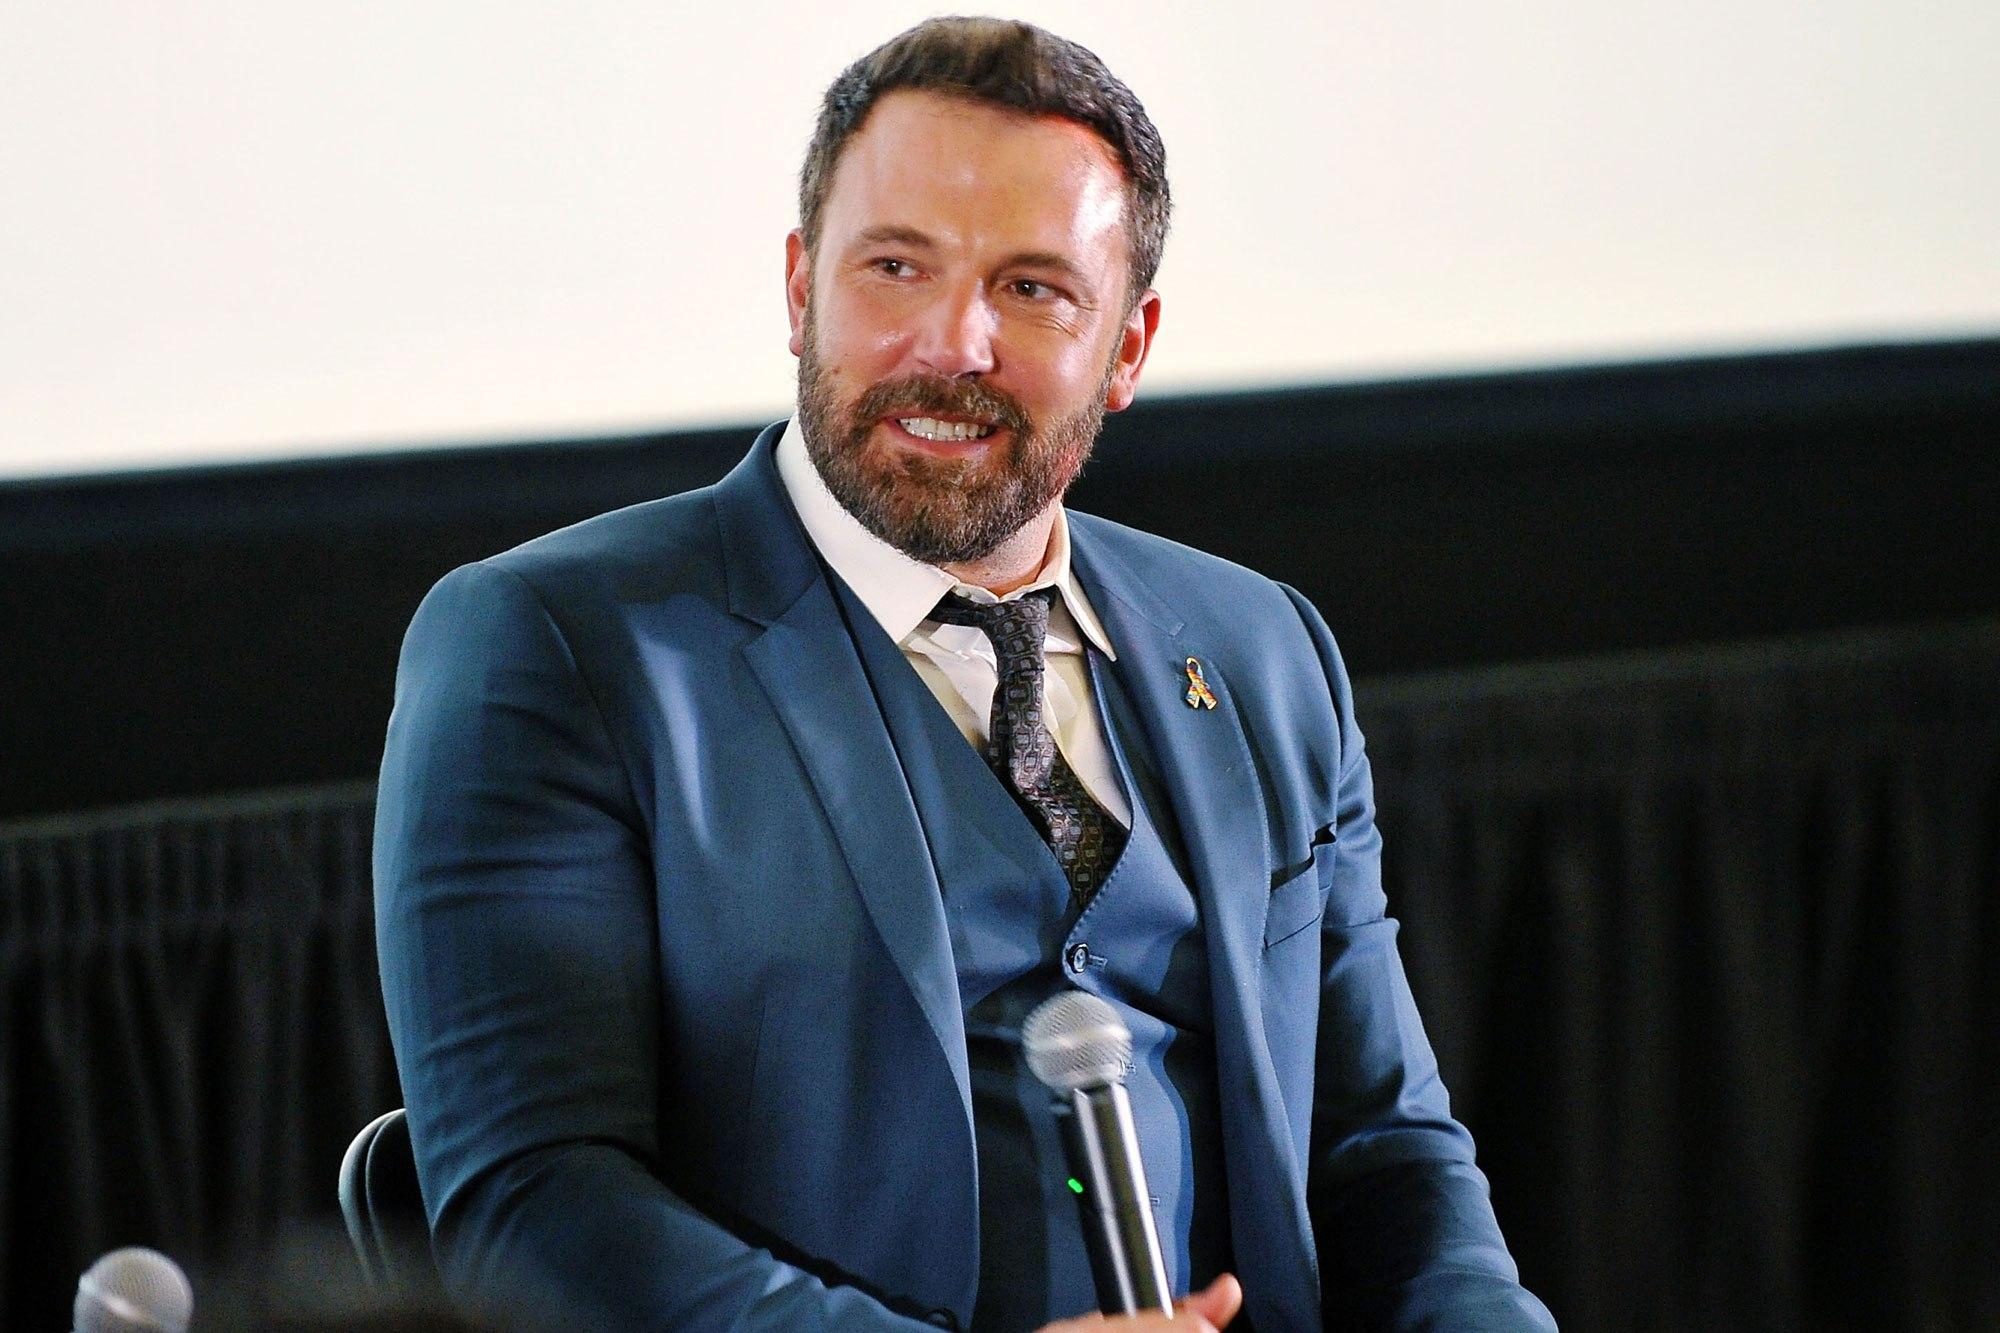 Ben Affleck critica Weinstein, utente Twitter lo accusa di molestie